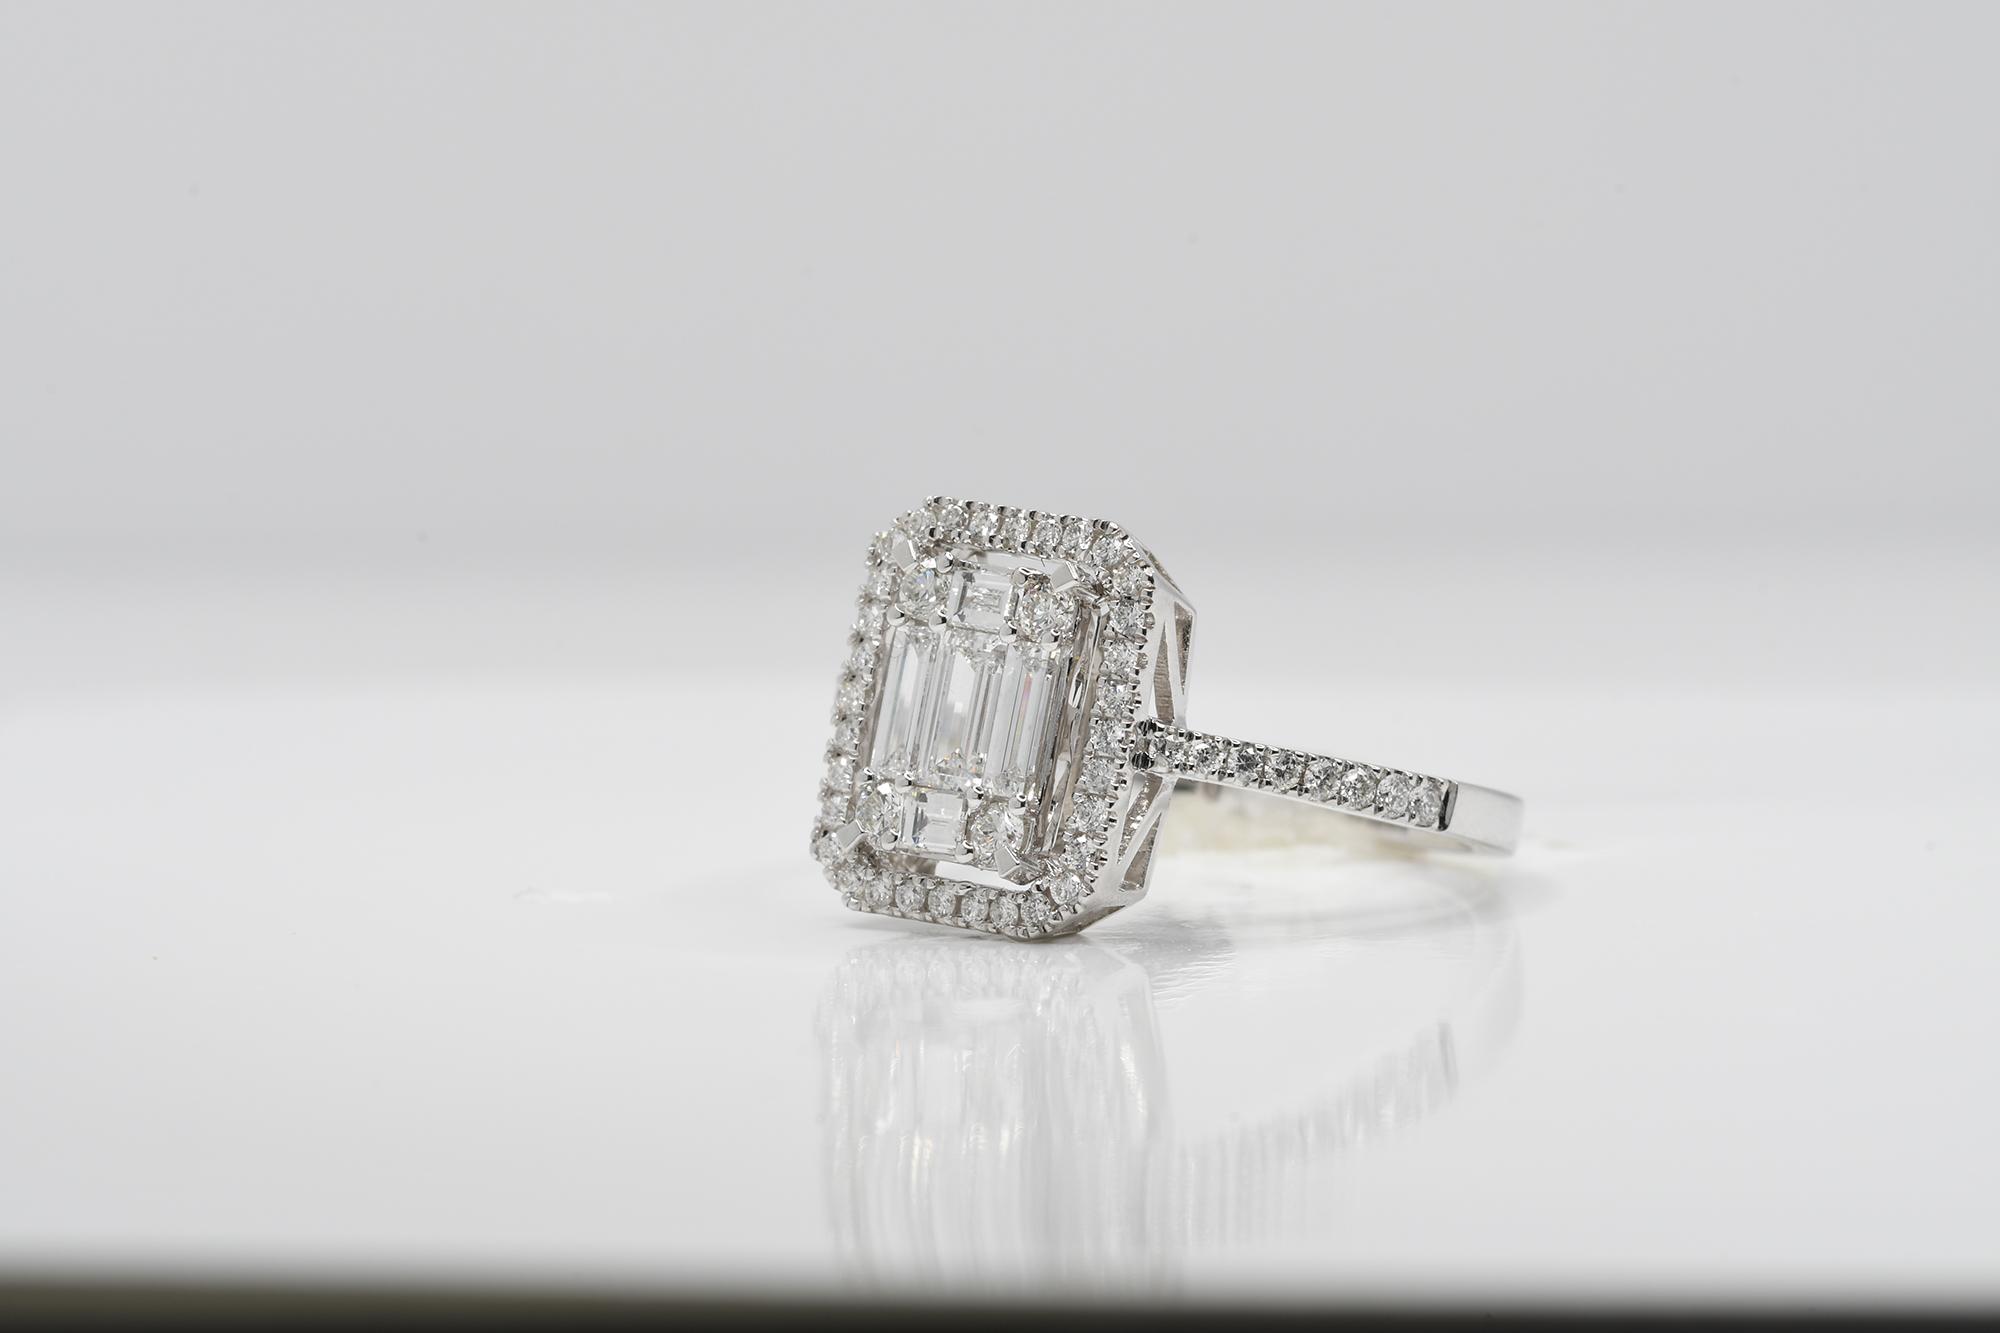 Diamond Ring - Image 3 of 3